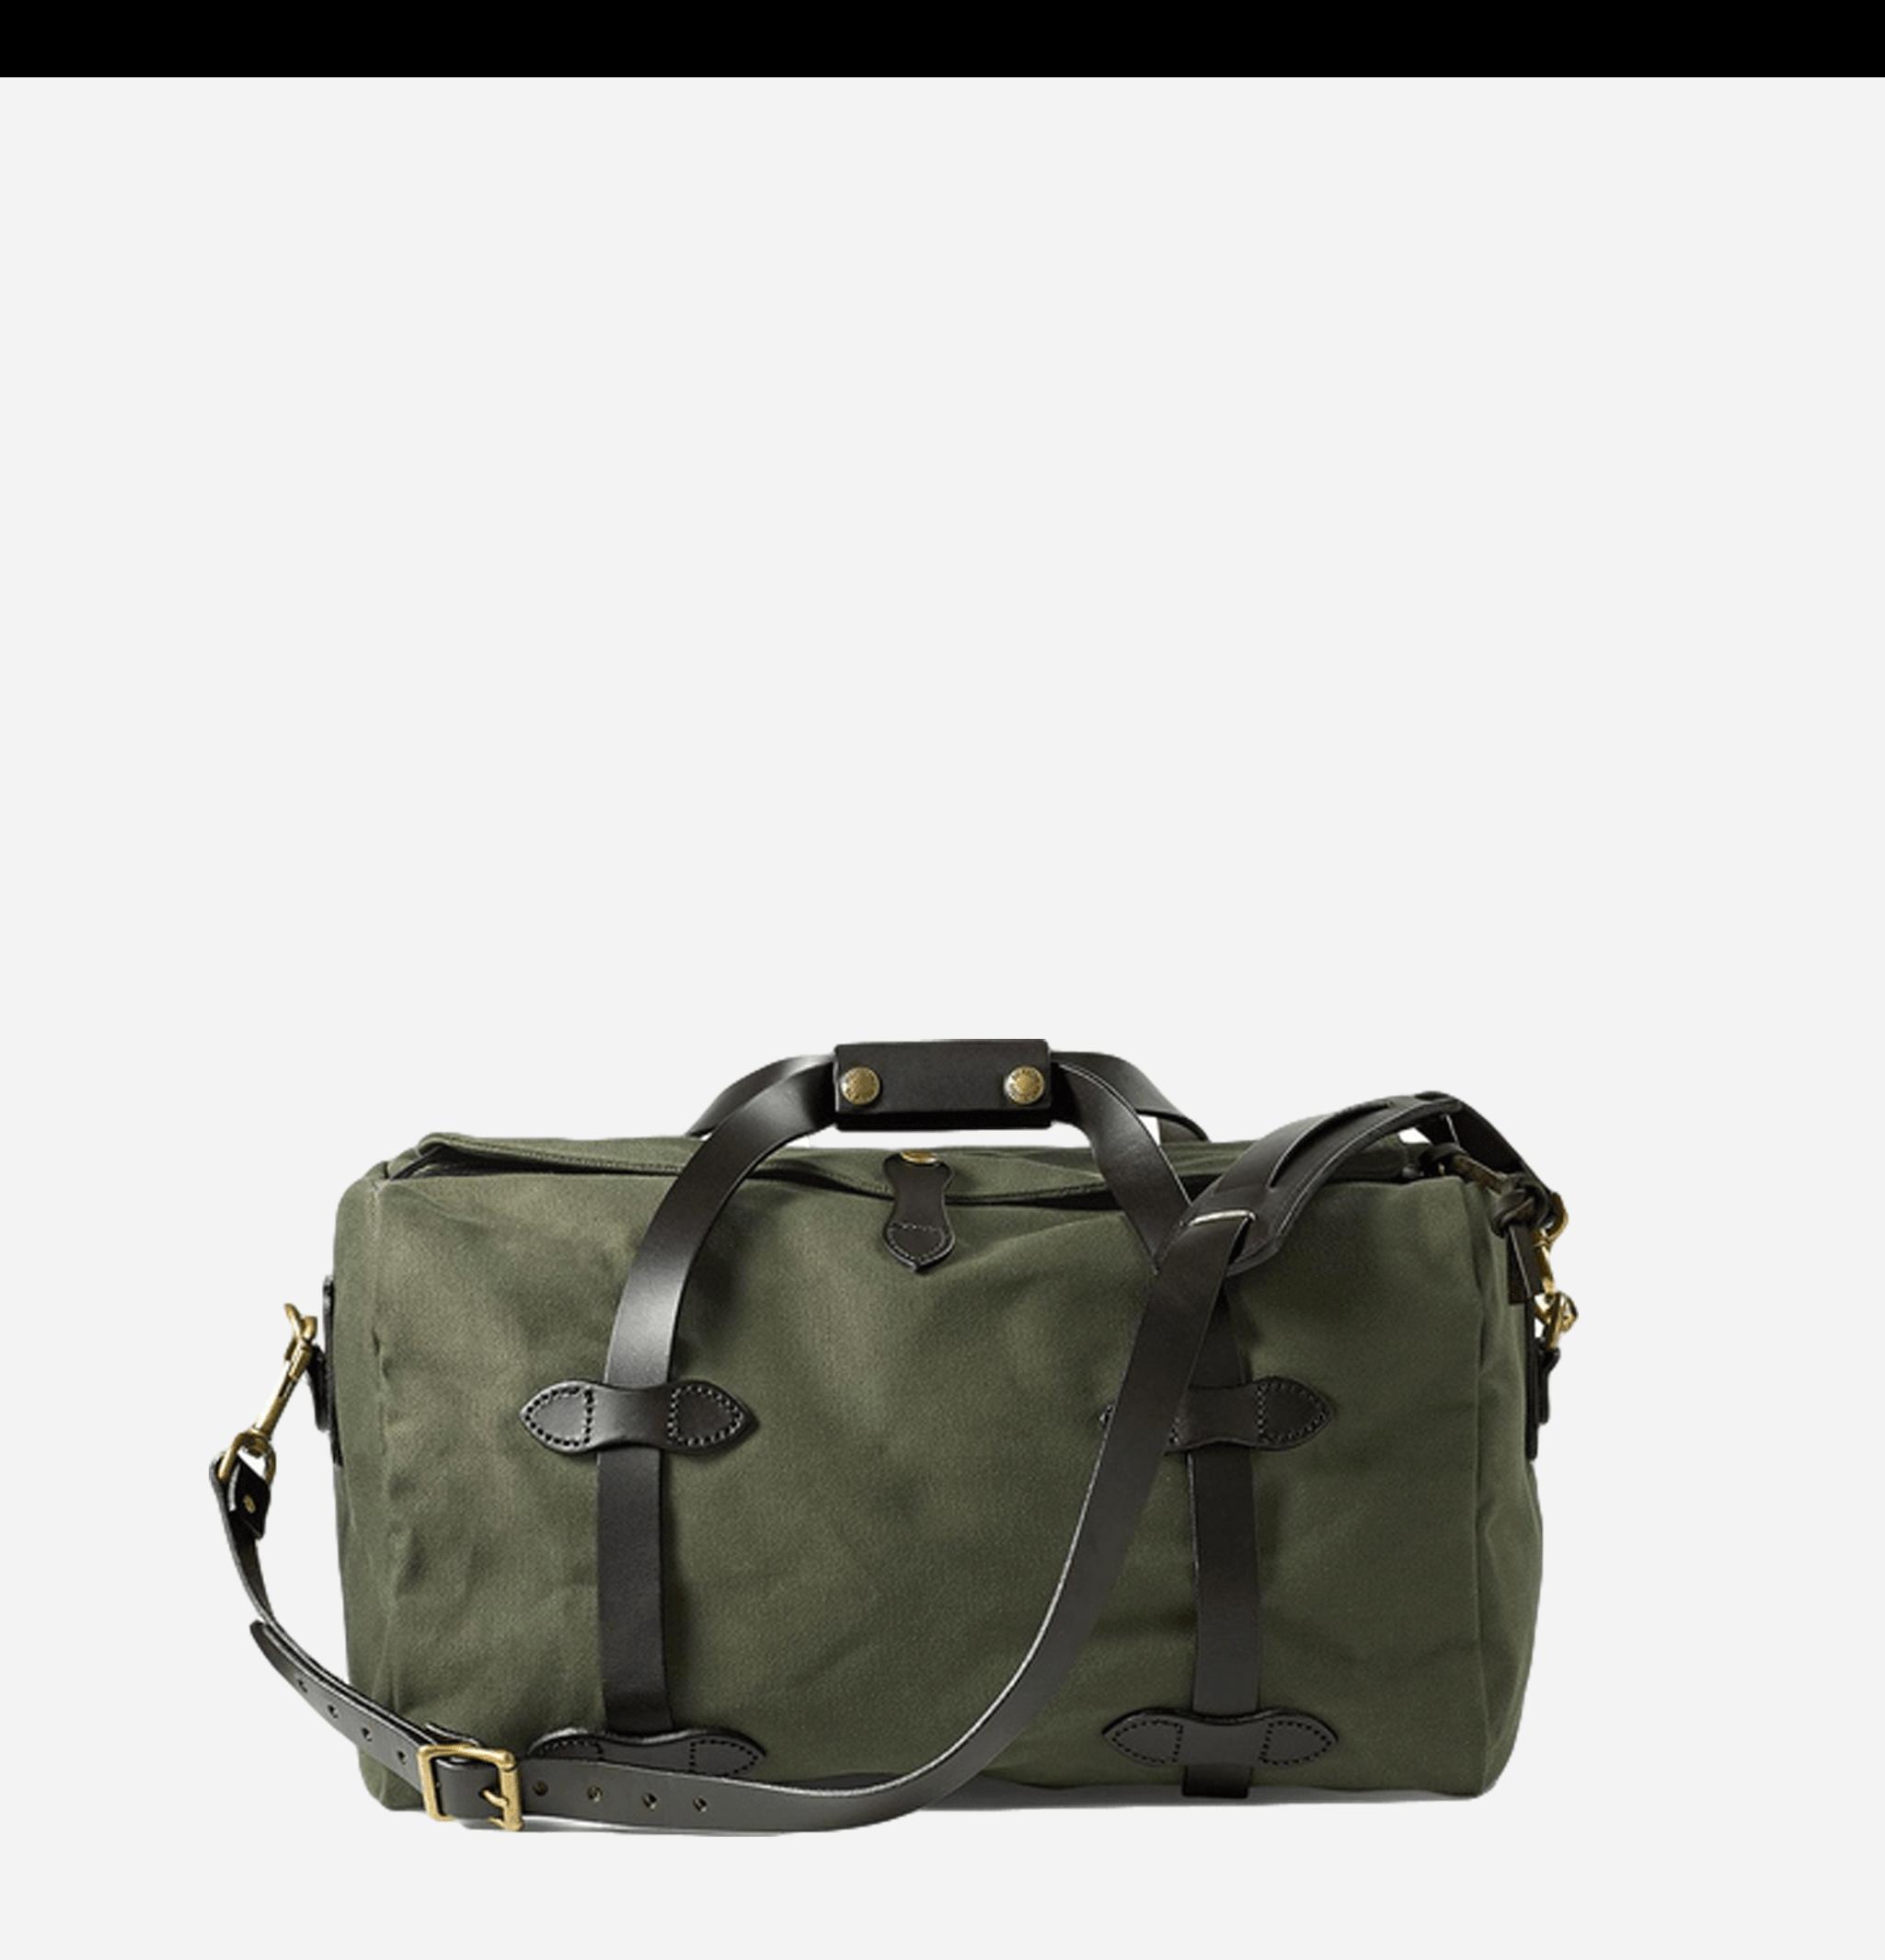 70220 - Small Duffle Bag...